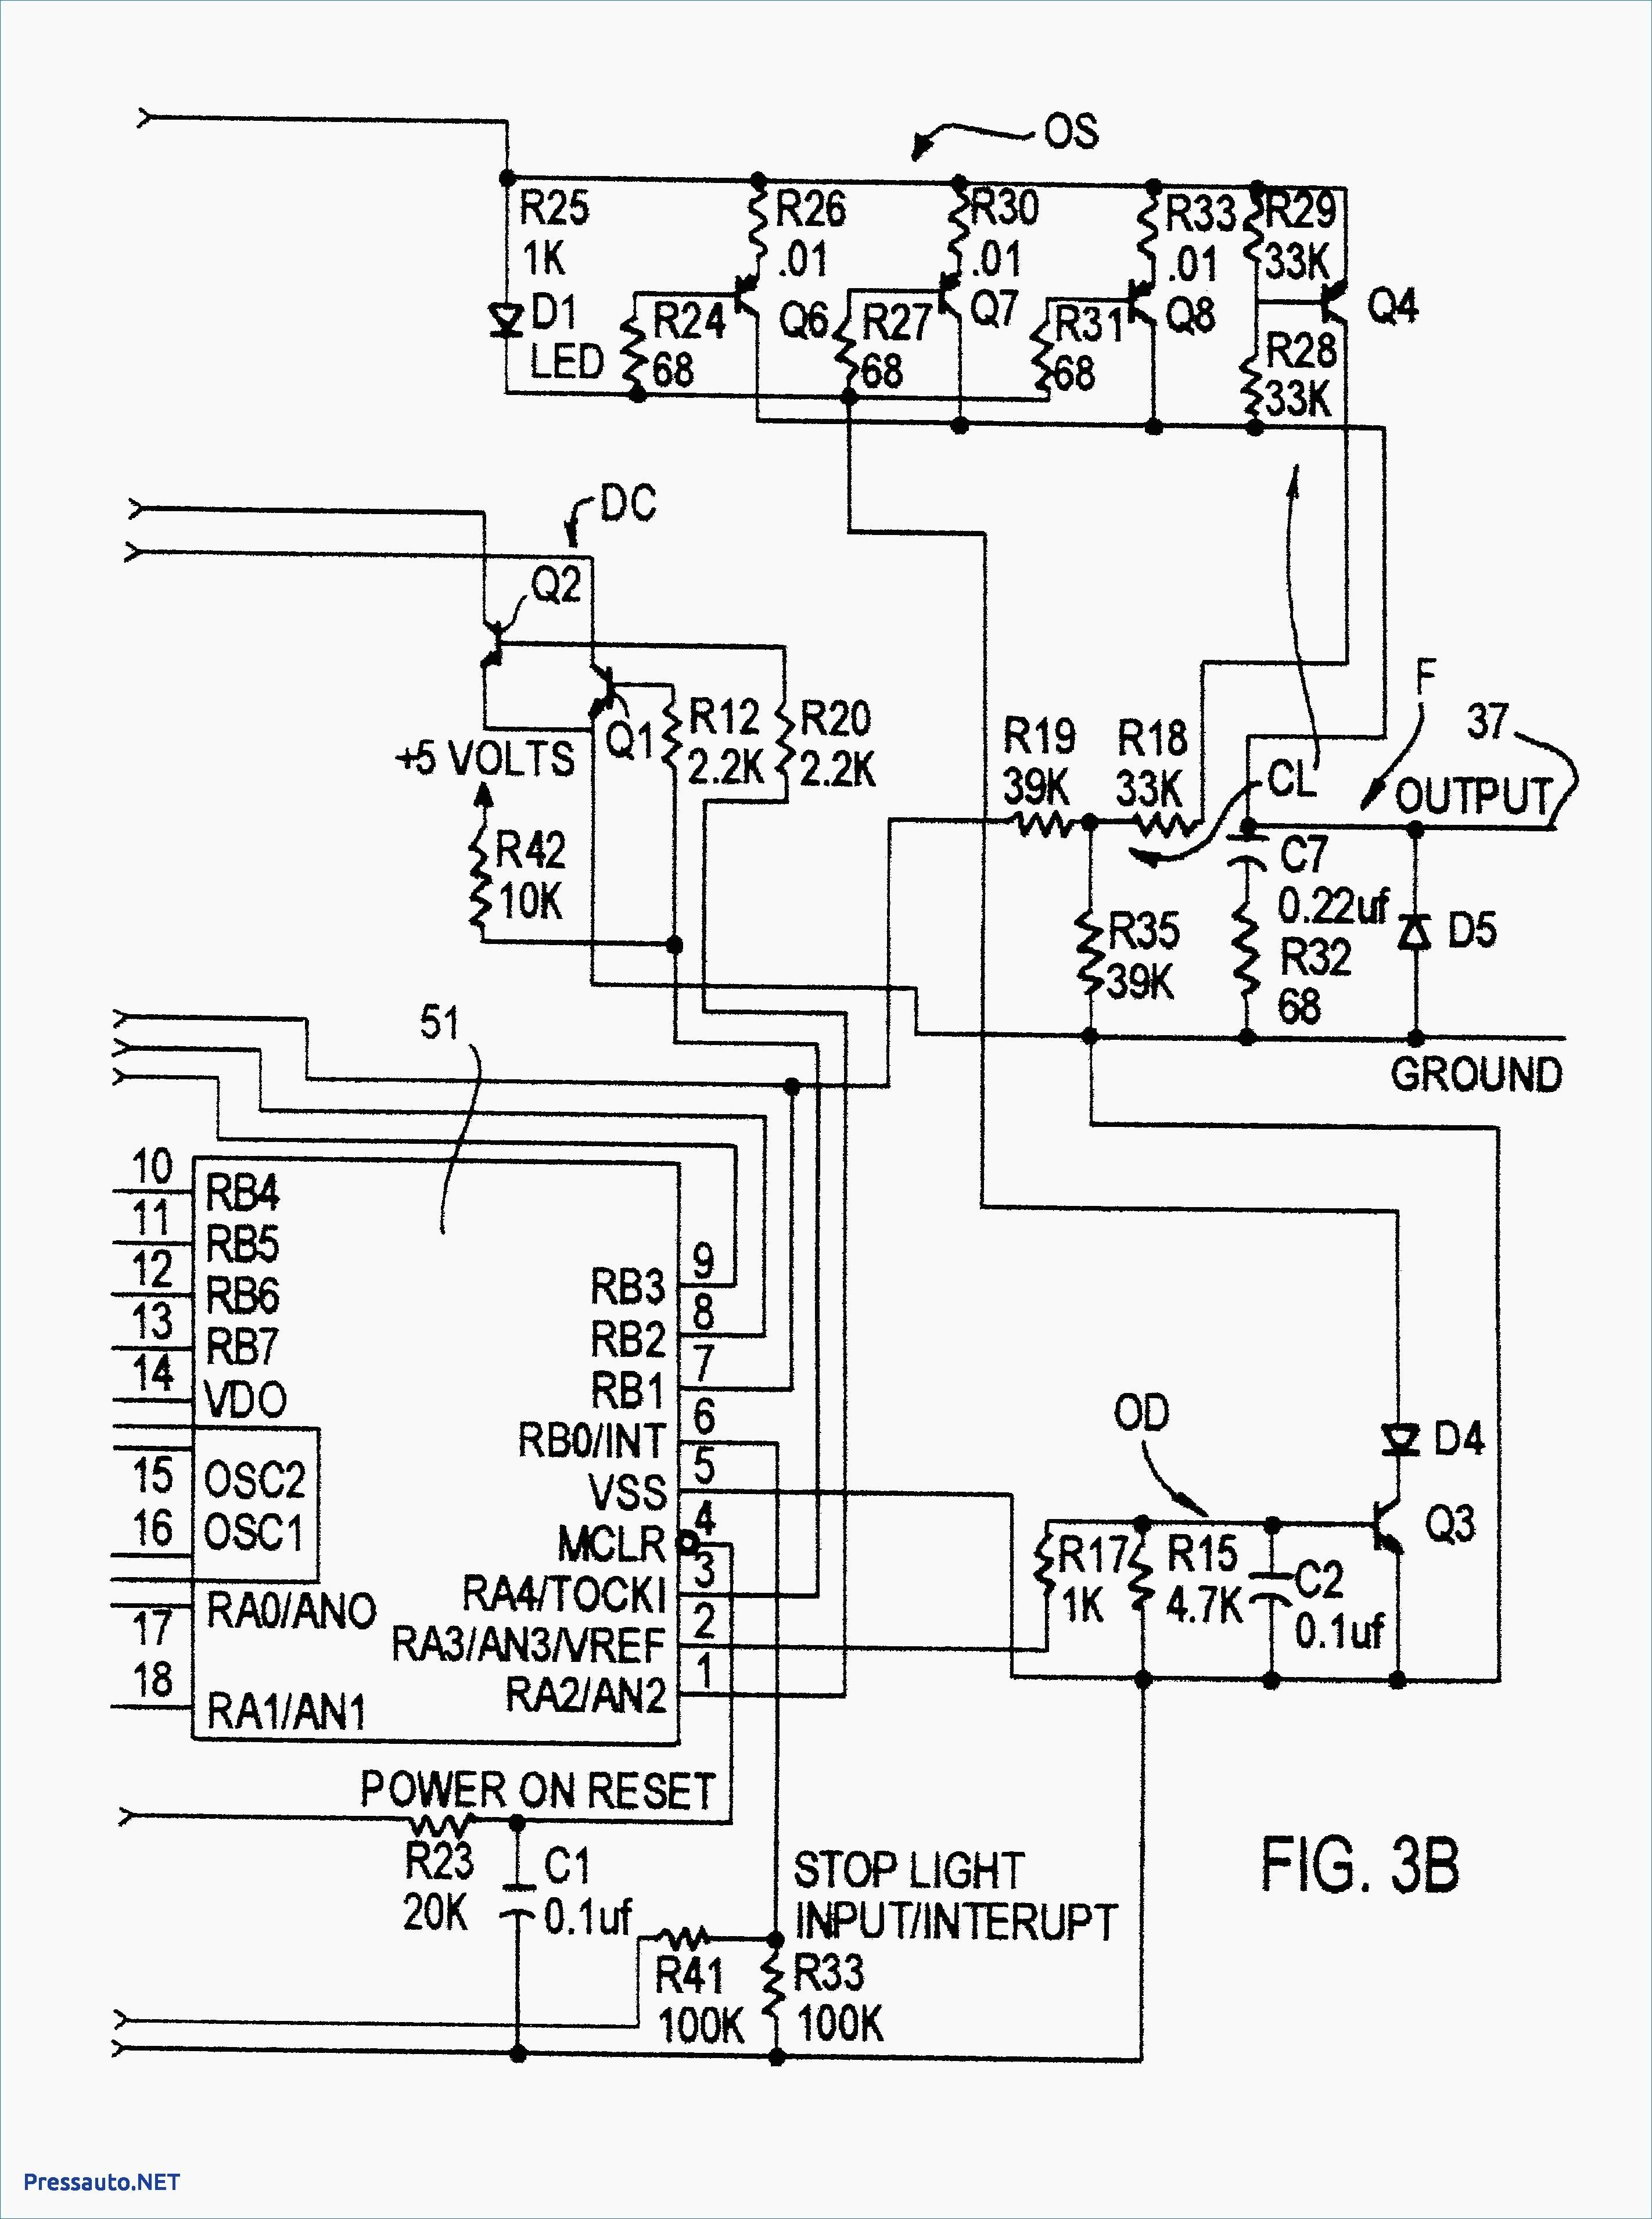 2003 Chevy Trailblazer Parts Diagram Trusted Wiring Grand Cherokee Blazer Catalog Pics Jeep